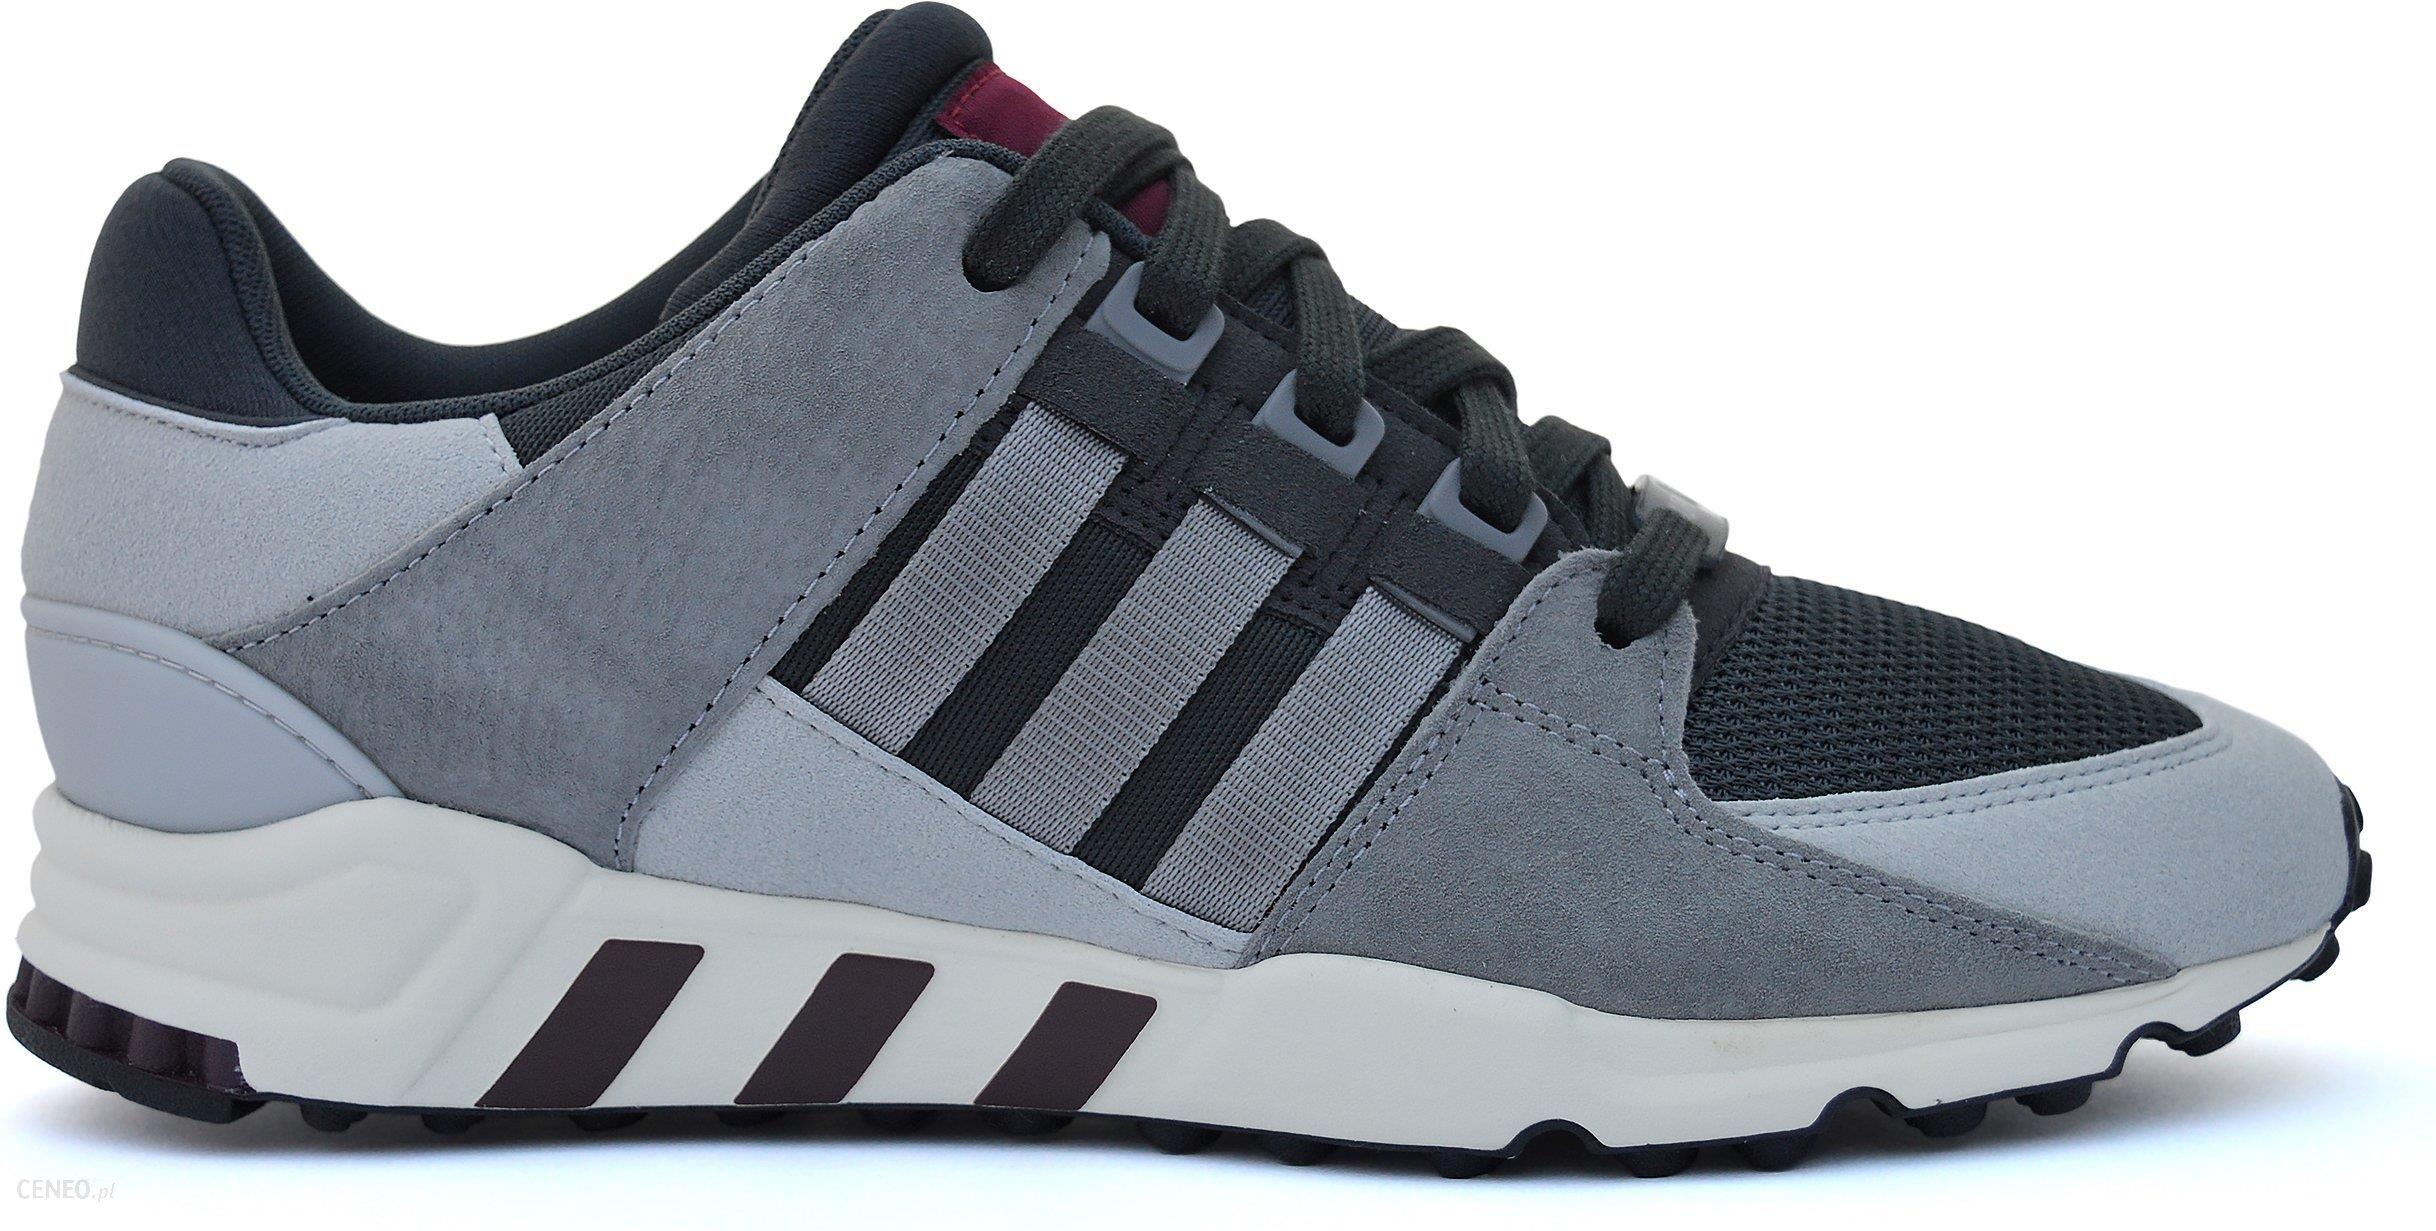 Adidas Eqt Support Rf CQ2420 r. 43 13 W wa Ceny i opinie Ceneo.pl